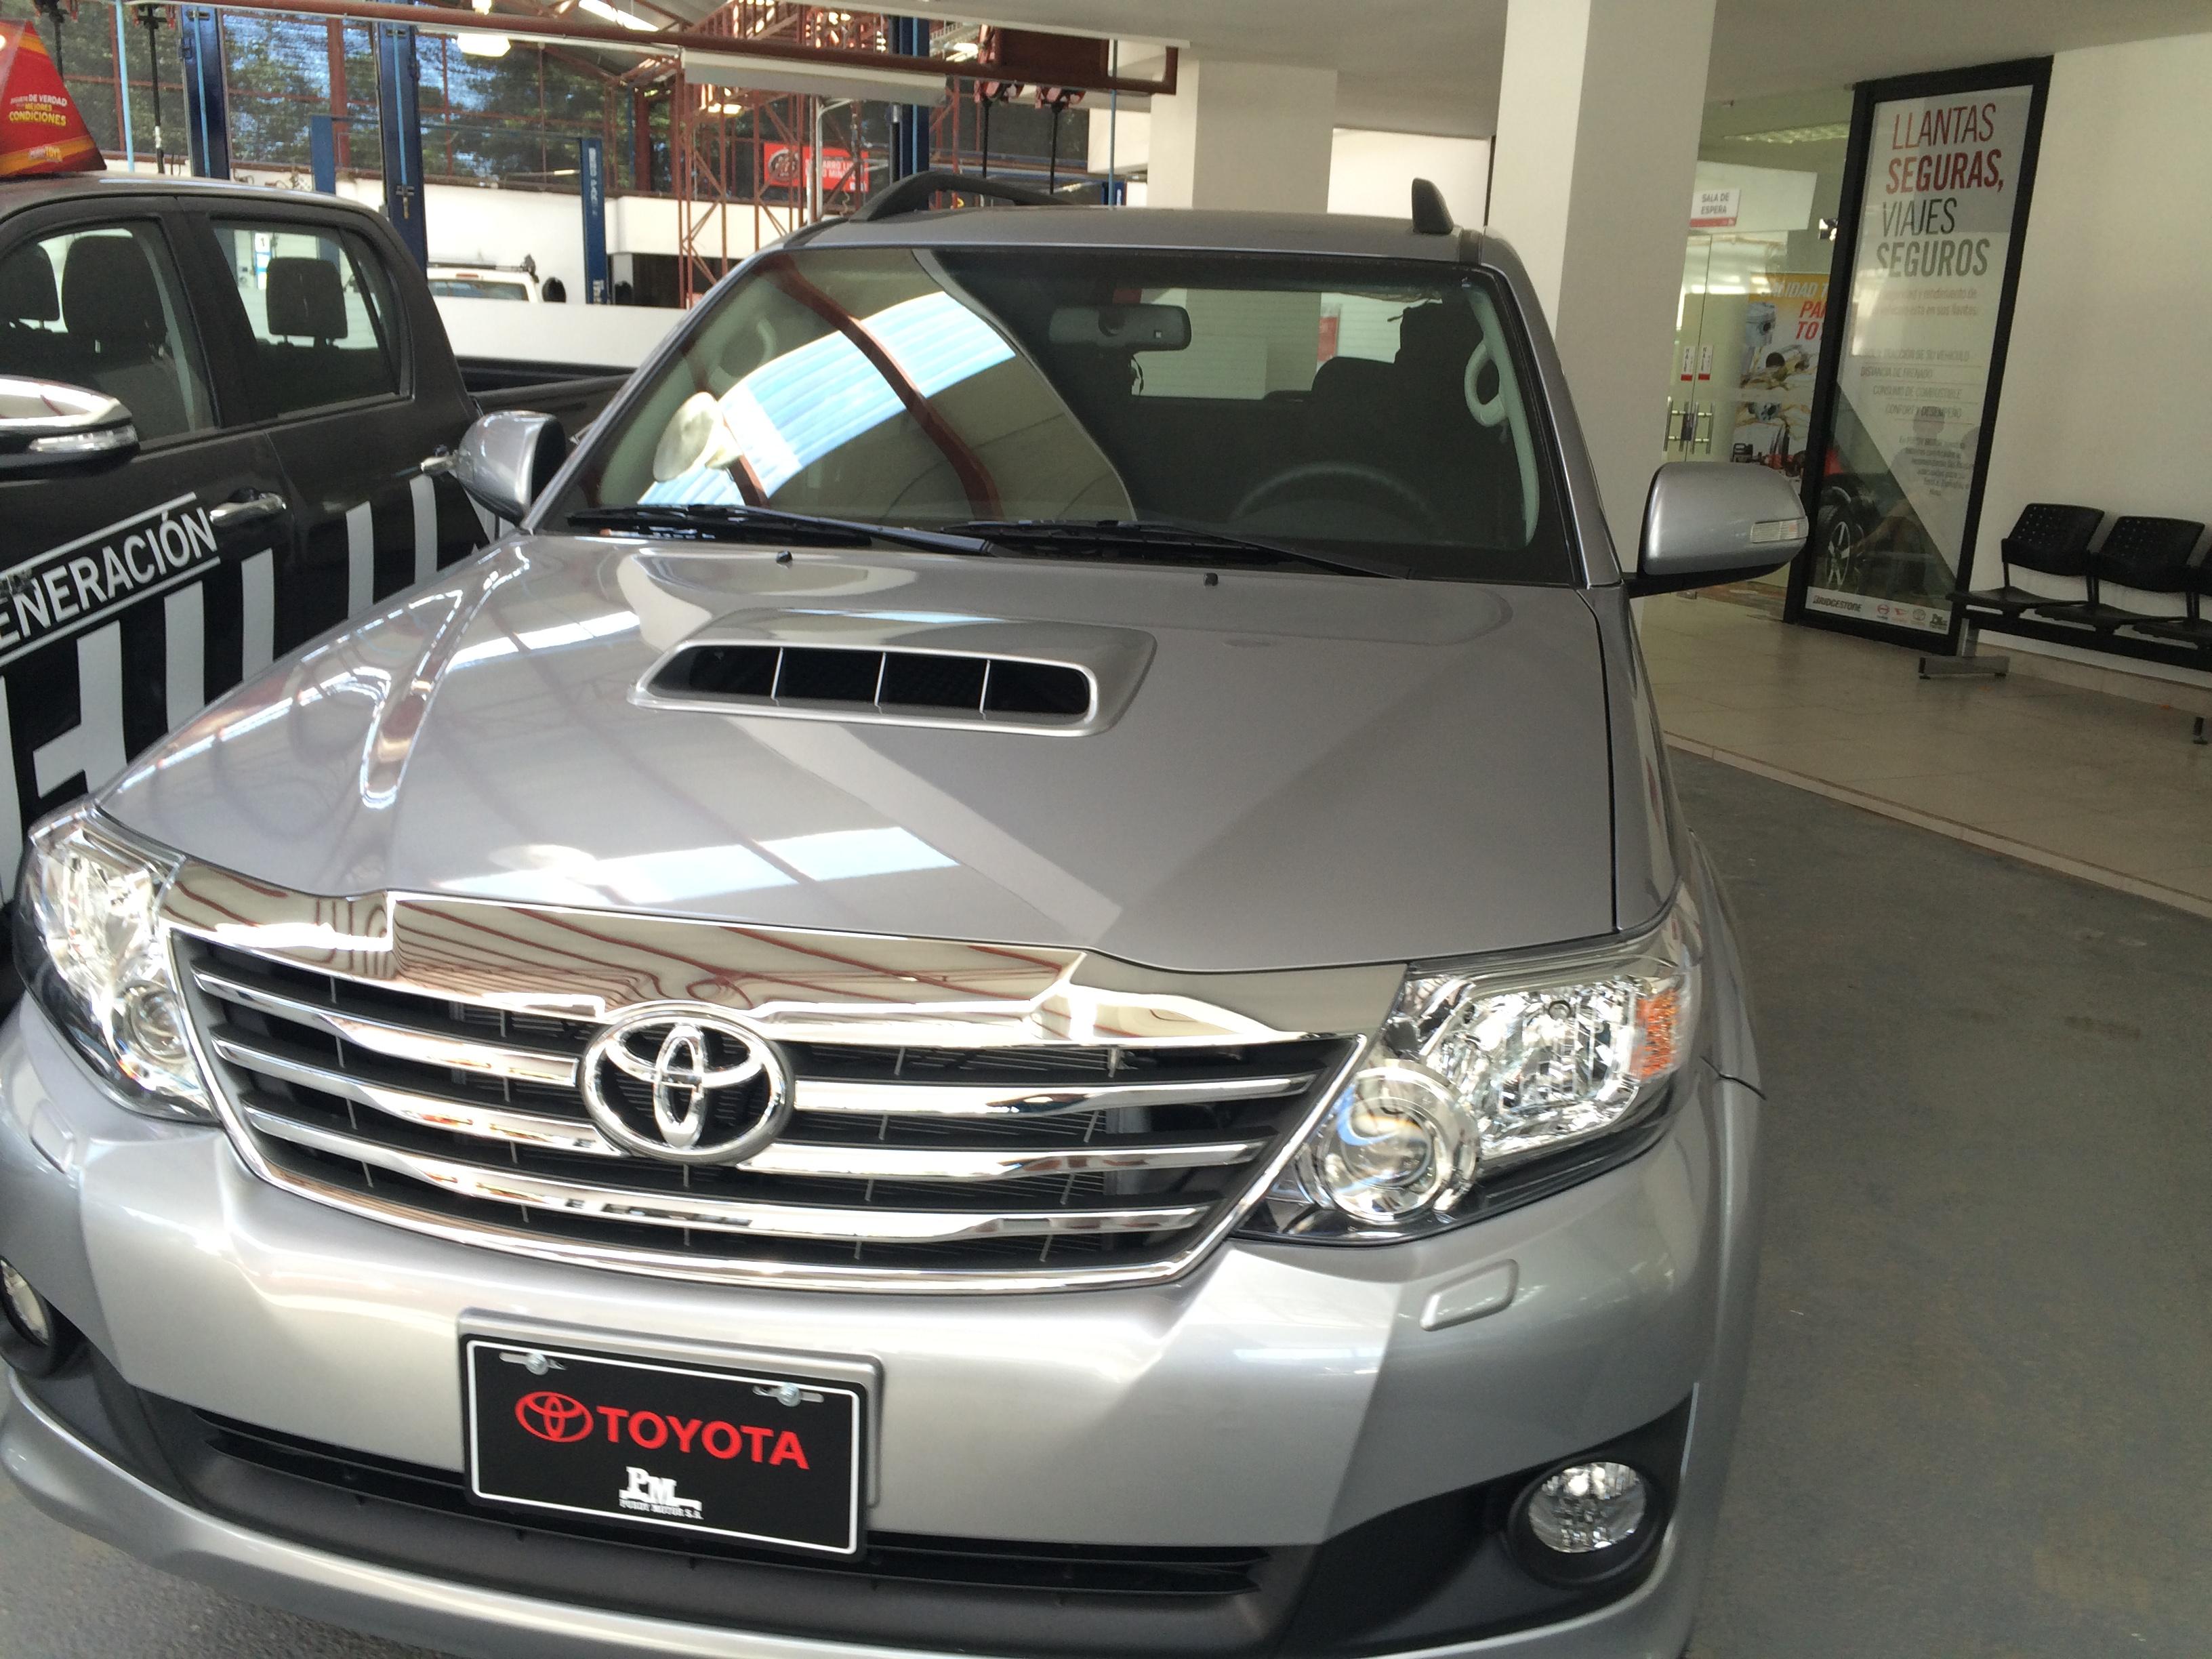 New Toyota 4x4 in Costa Rica